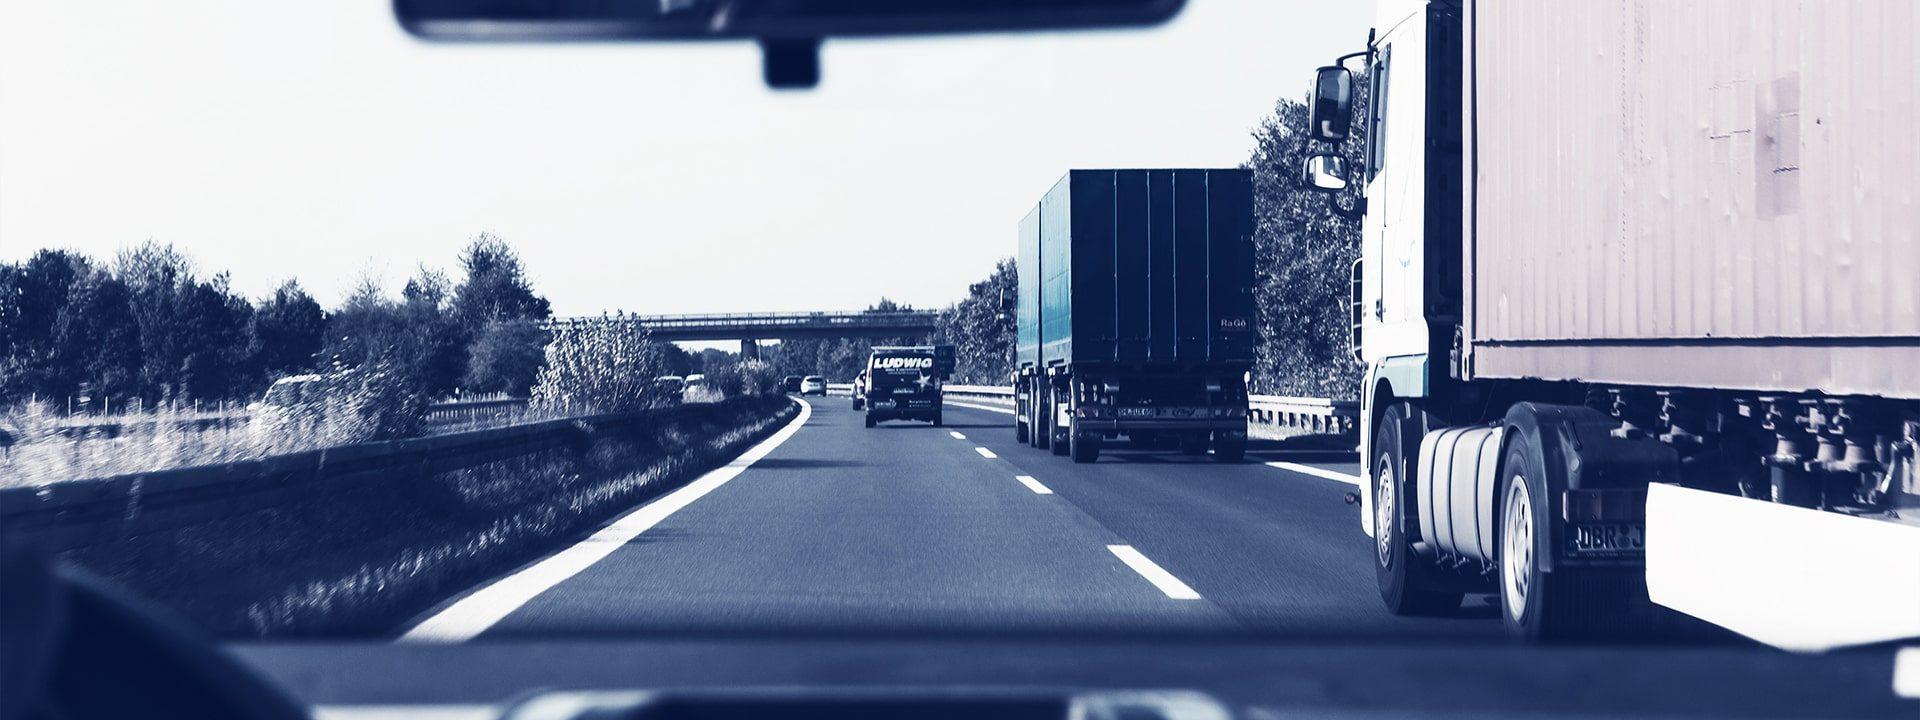 automotive-cars-expressway-172074b